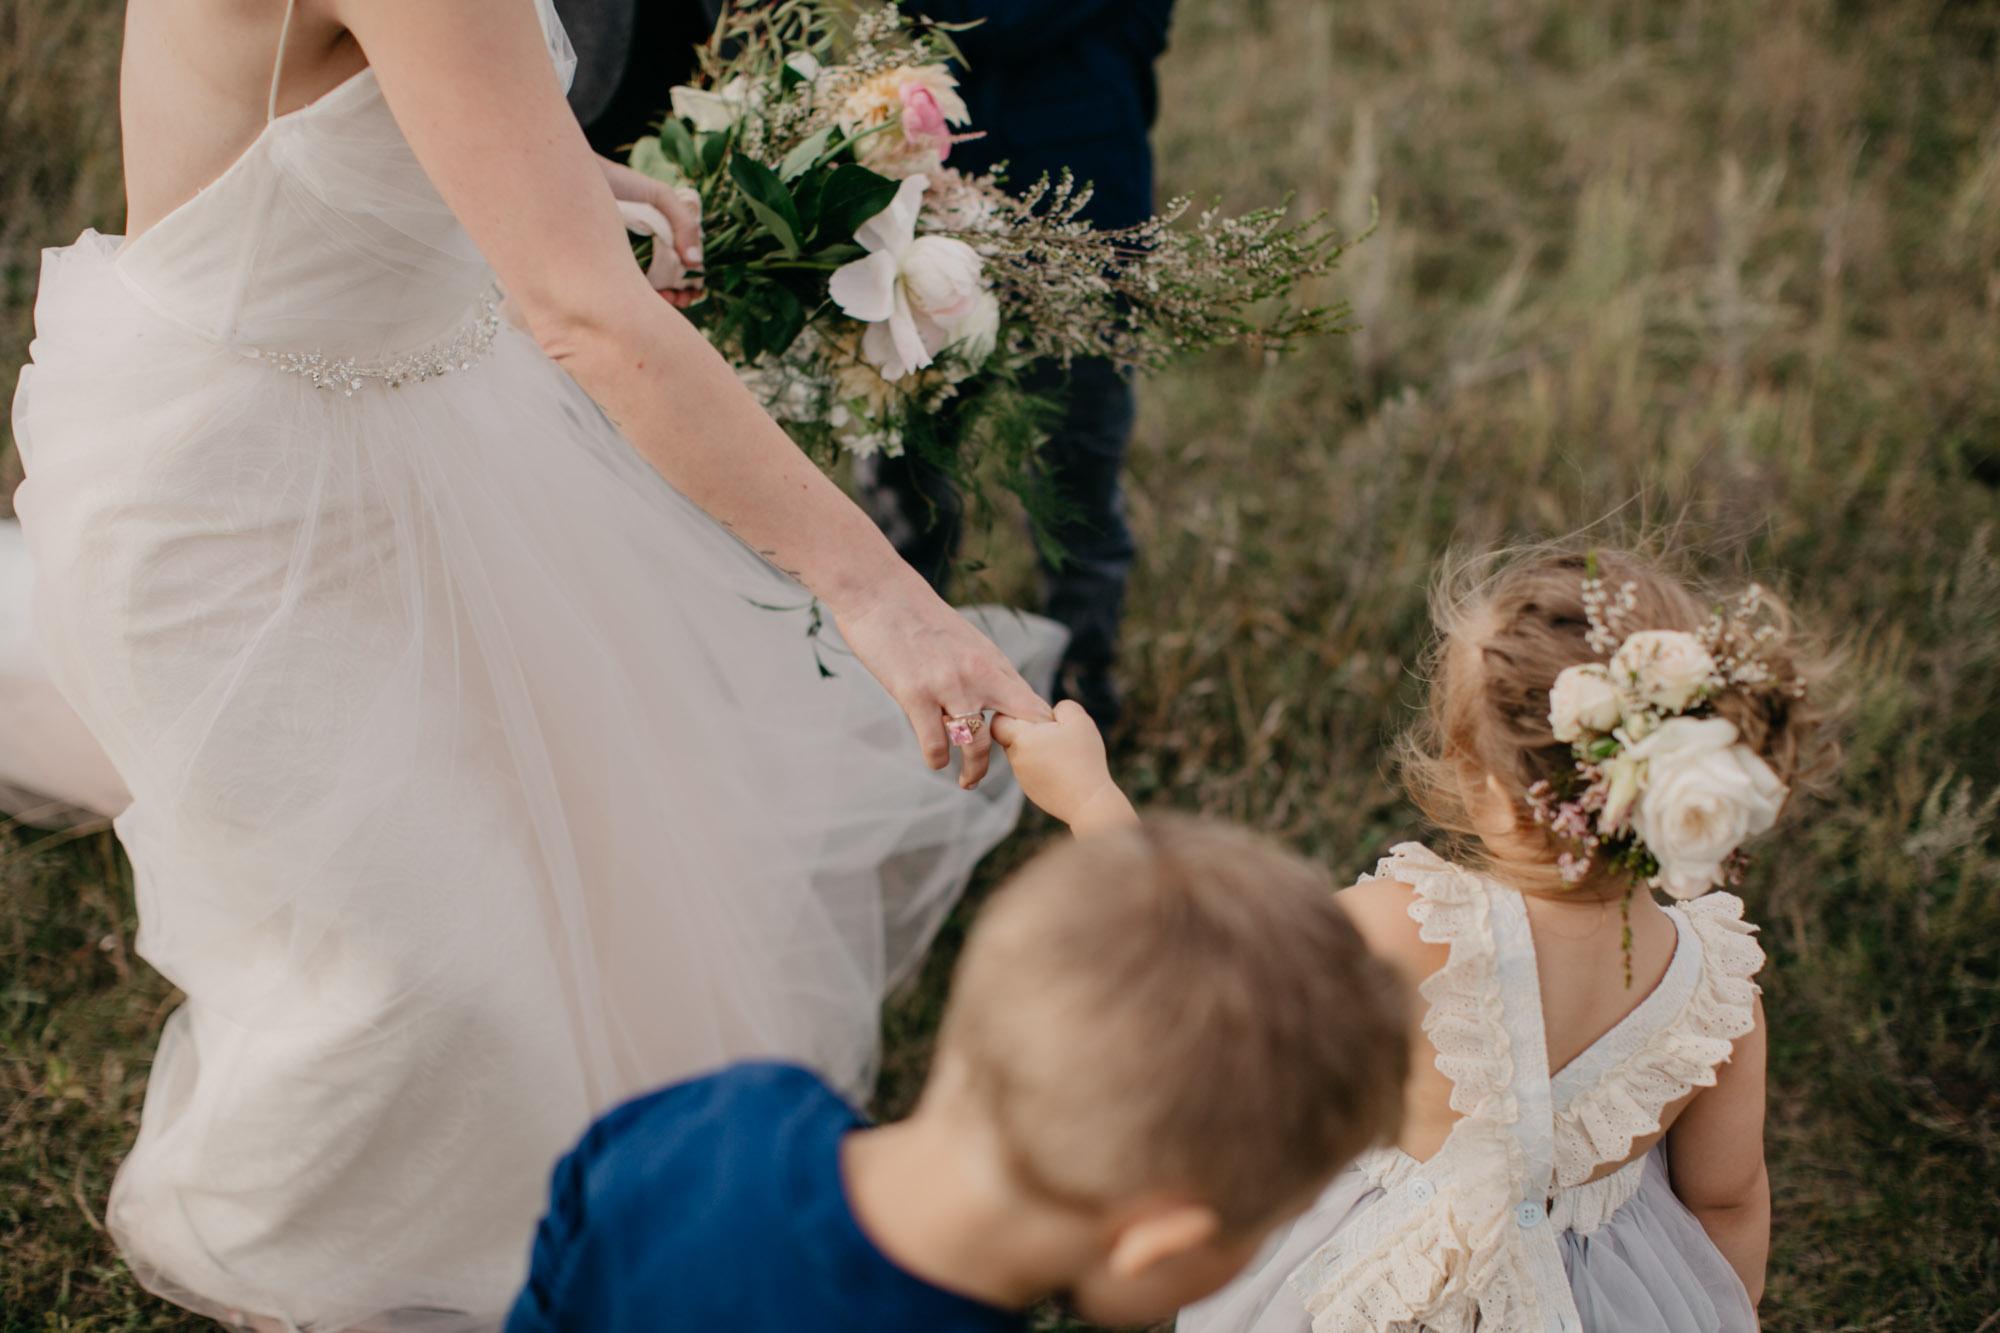 omaha-wedding-photographer-meghan-time-27.jpg